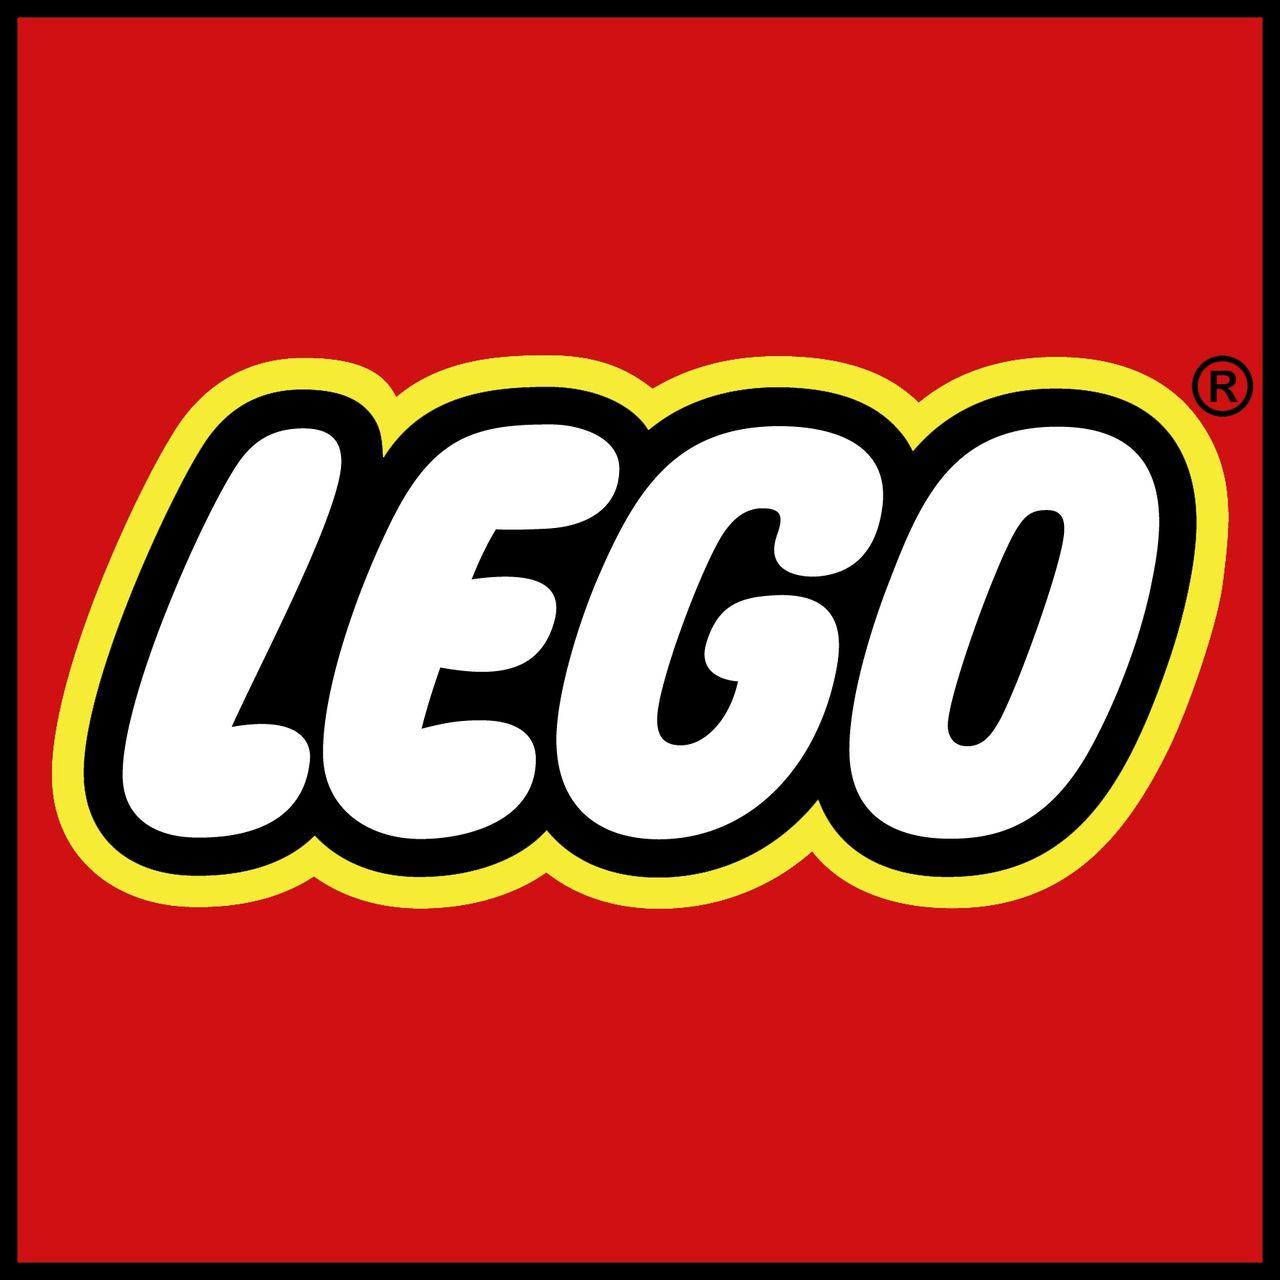 Lego fortsätter sitt segertåg